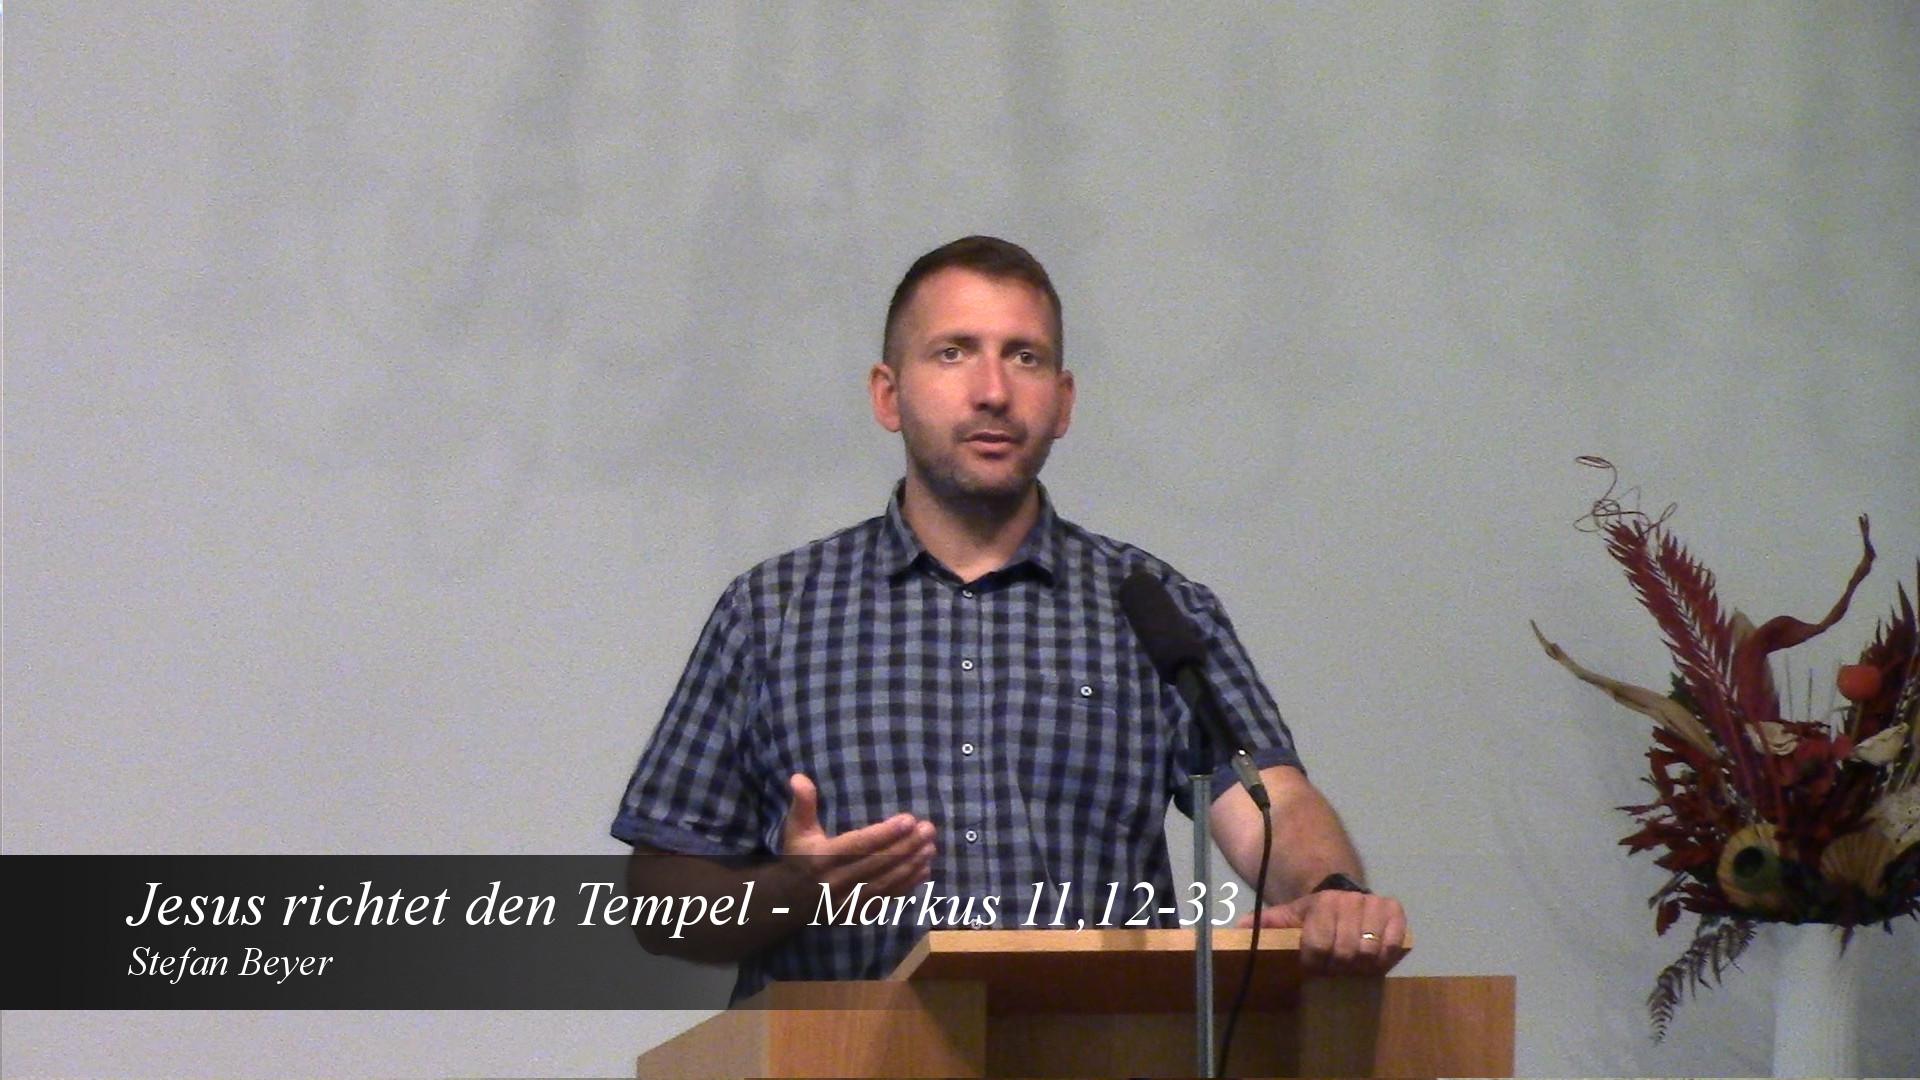 Jesus richtet den Tempel